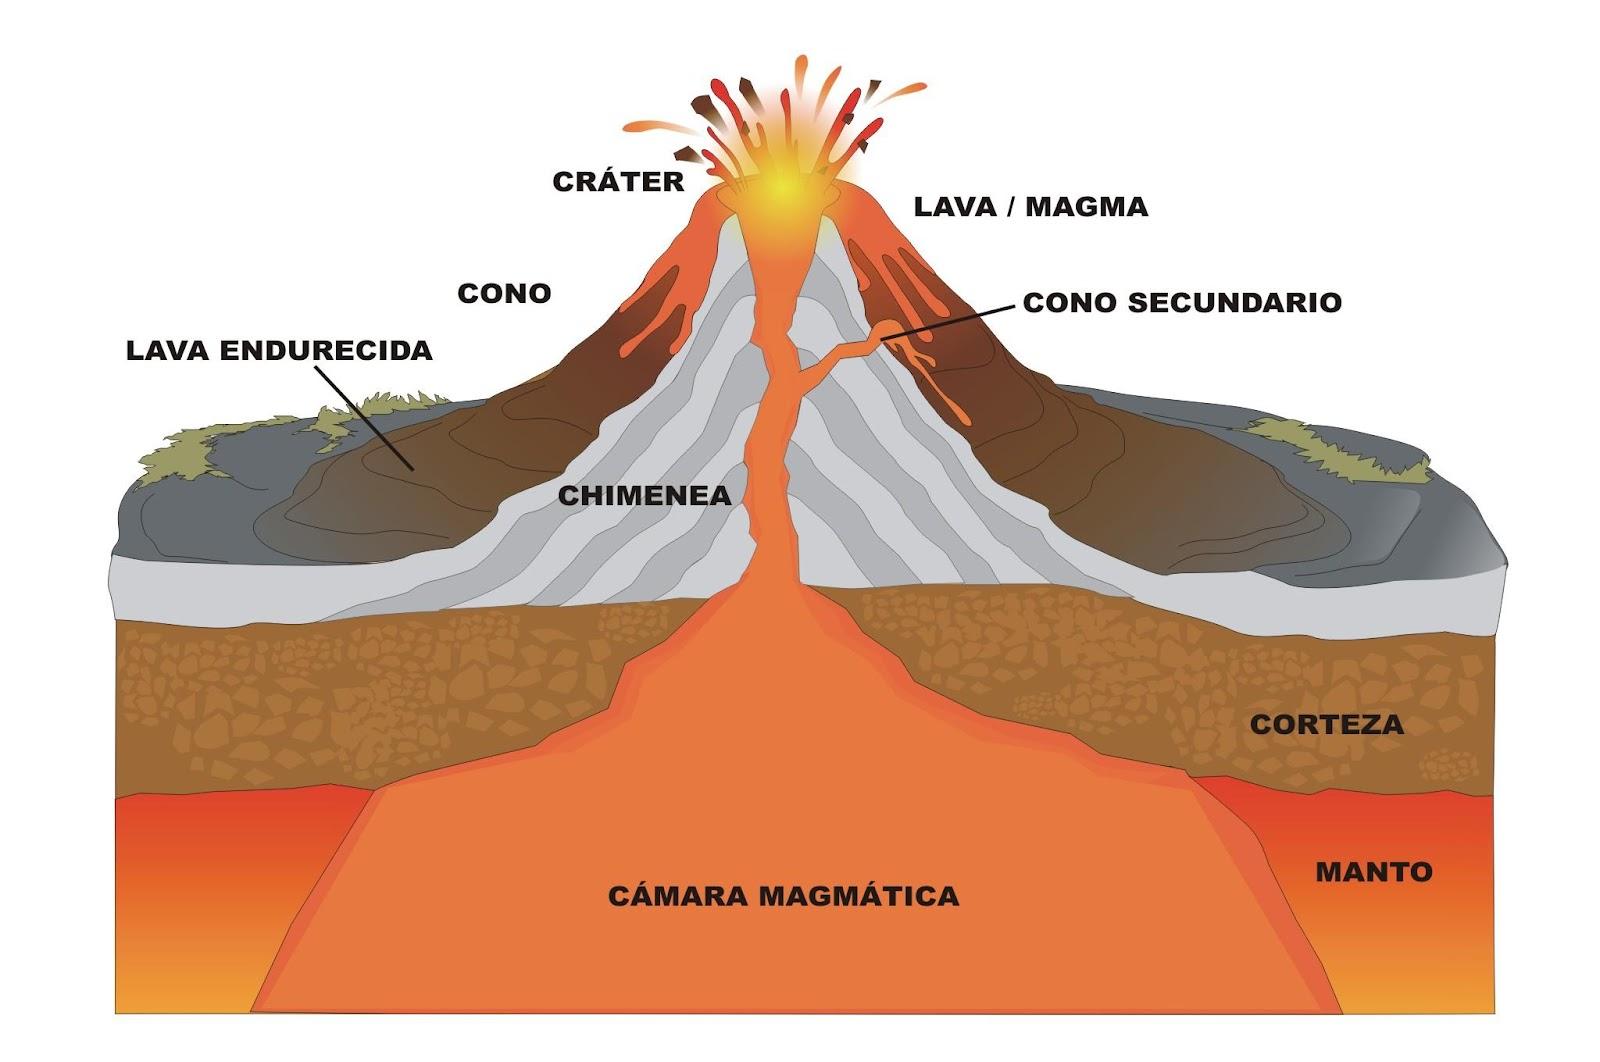 stratovolcano diagram with labels sympathetic and parasympathetic violetas: volcÁn - vulcano